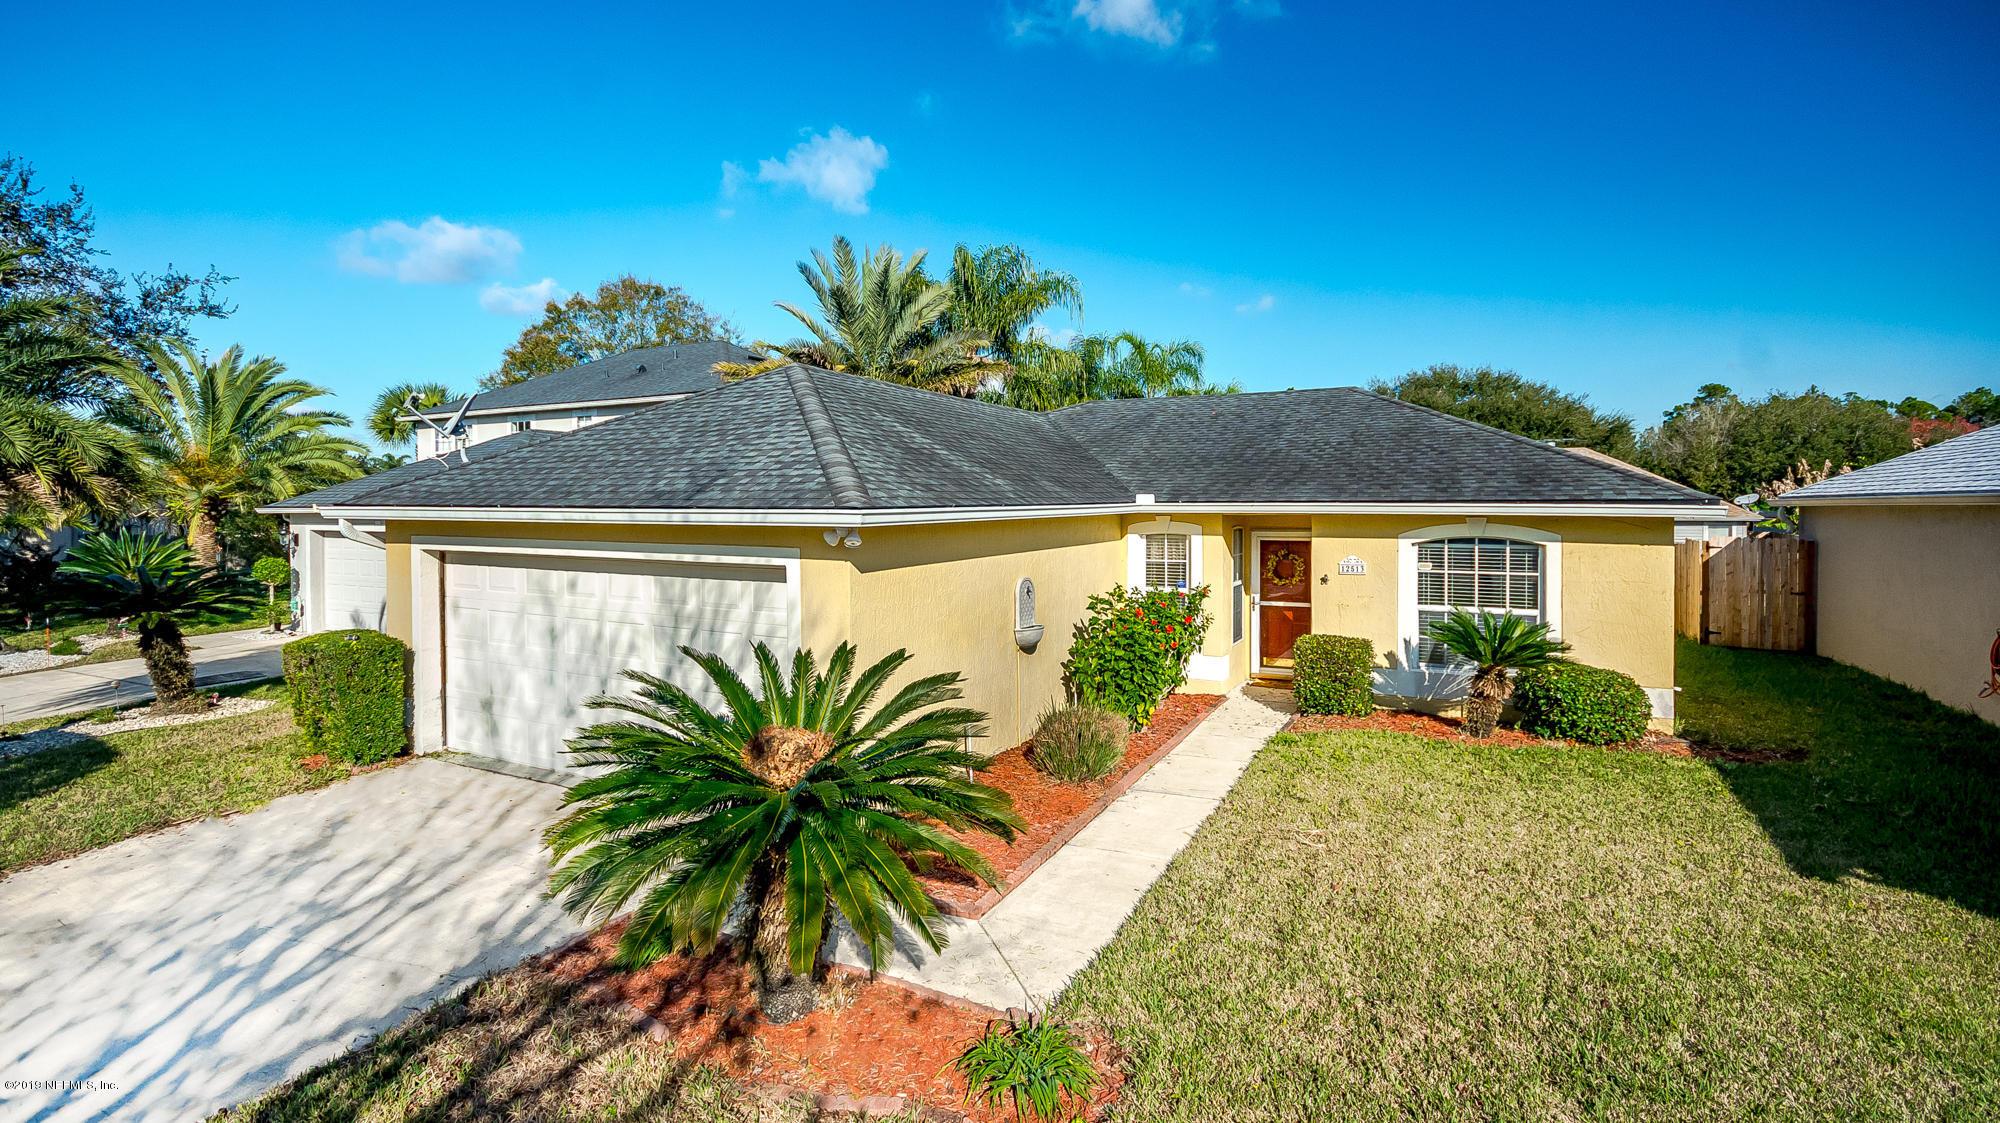 12513 Bent Bay Trl Jacksonville, FL 32224